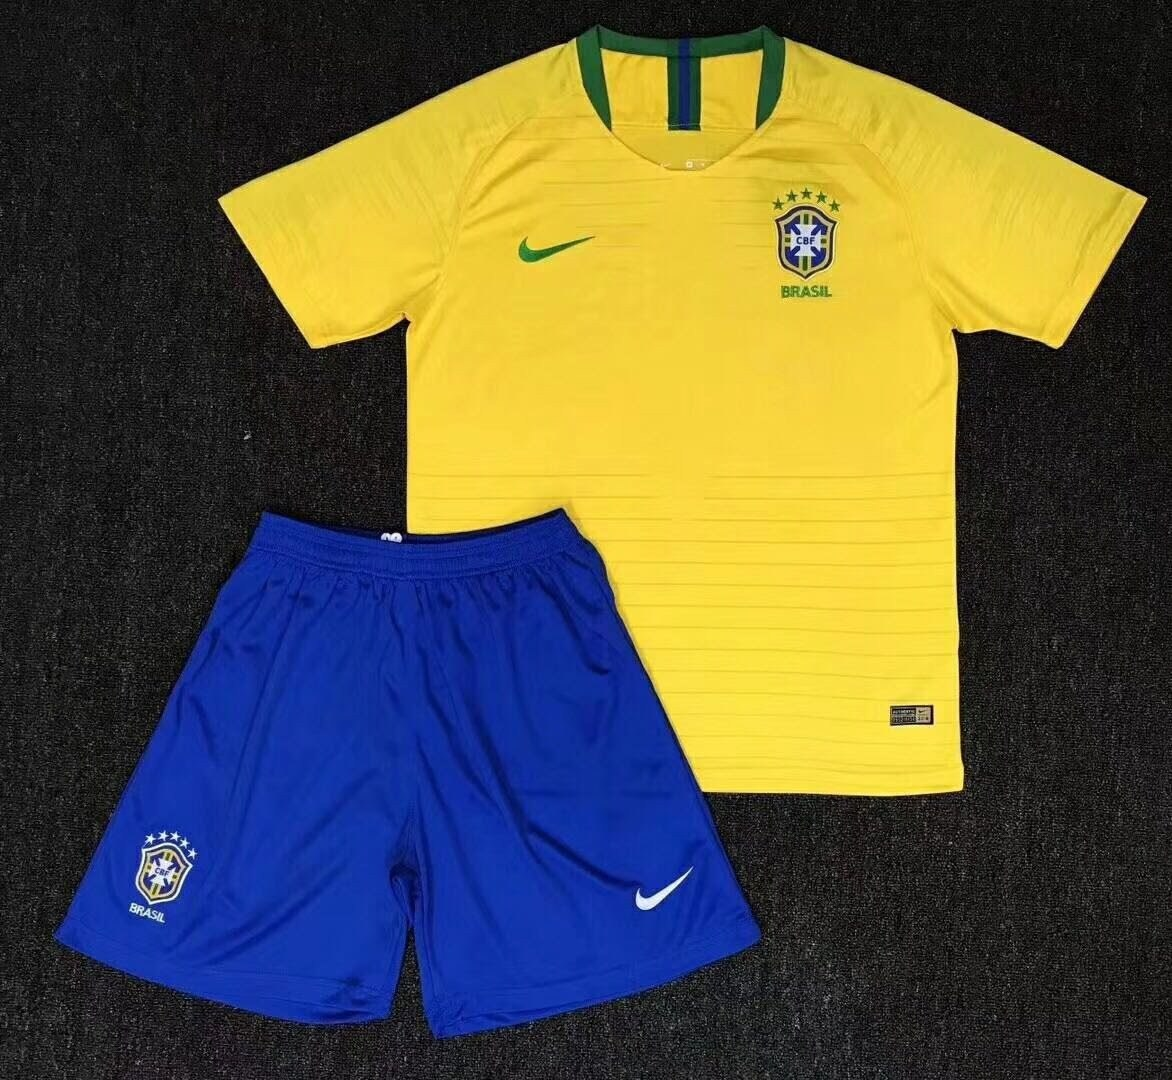 b2cccdb22 Kit Camisa E Short Times De Futebol Original Tailandesa - R  99